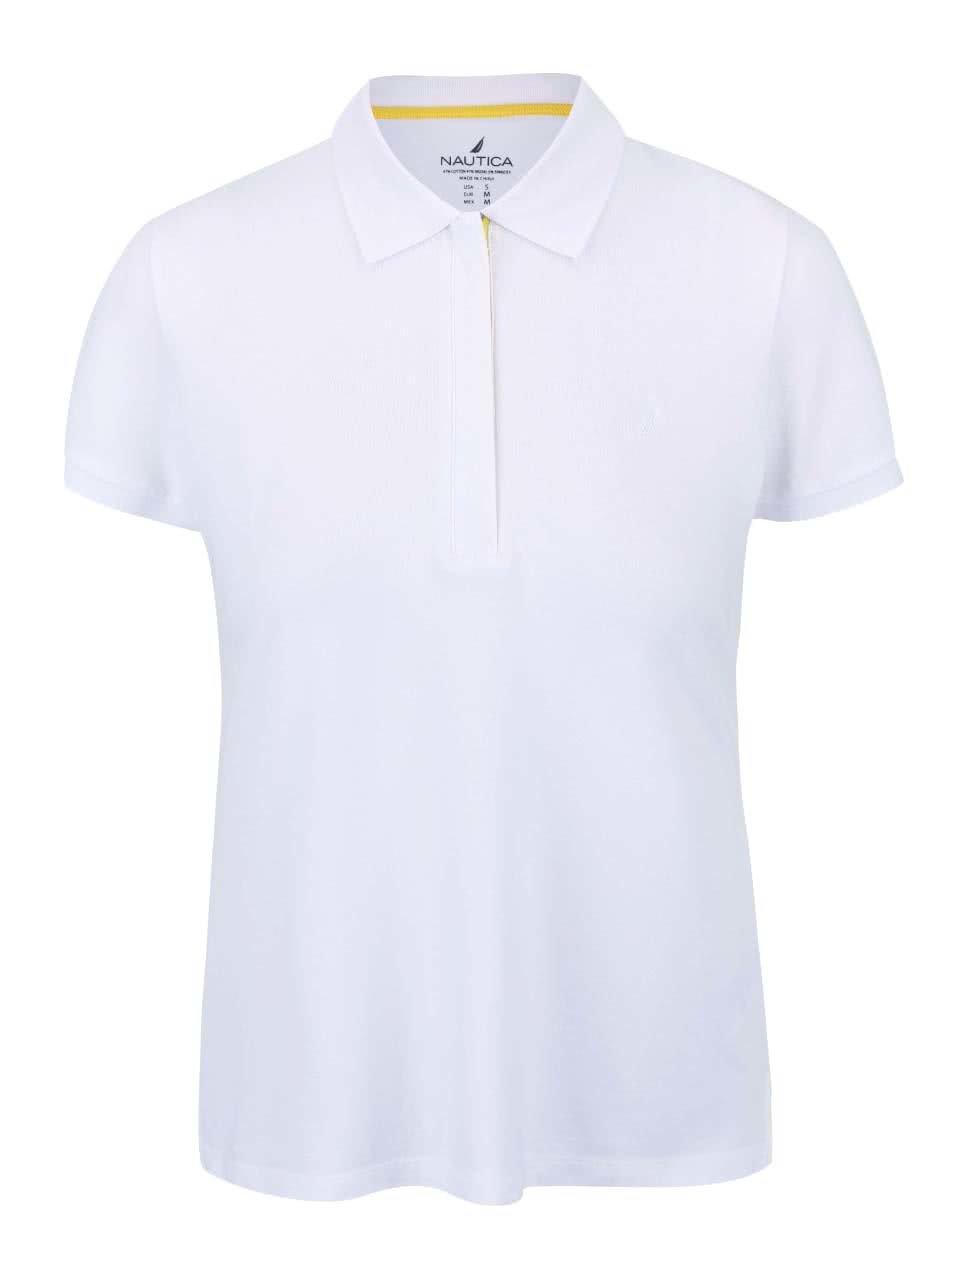 Bílé dámské polo tričko na zip se žlutým detailem Nautica